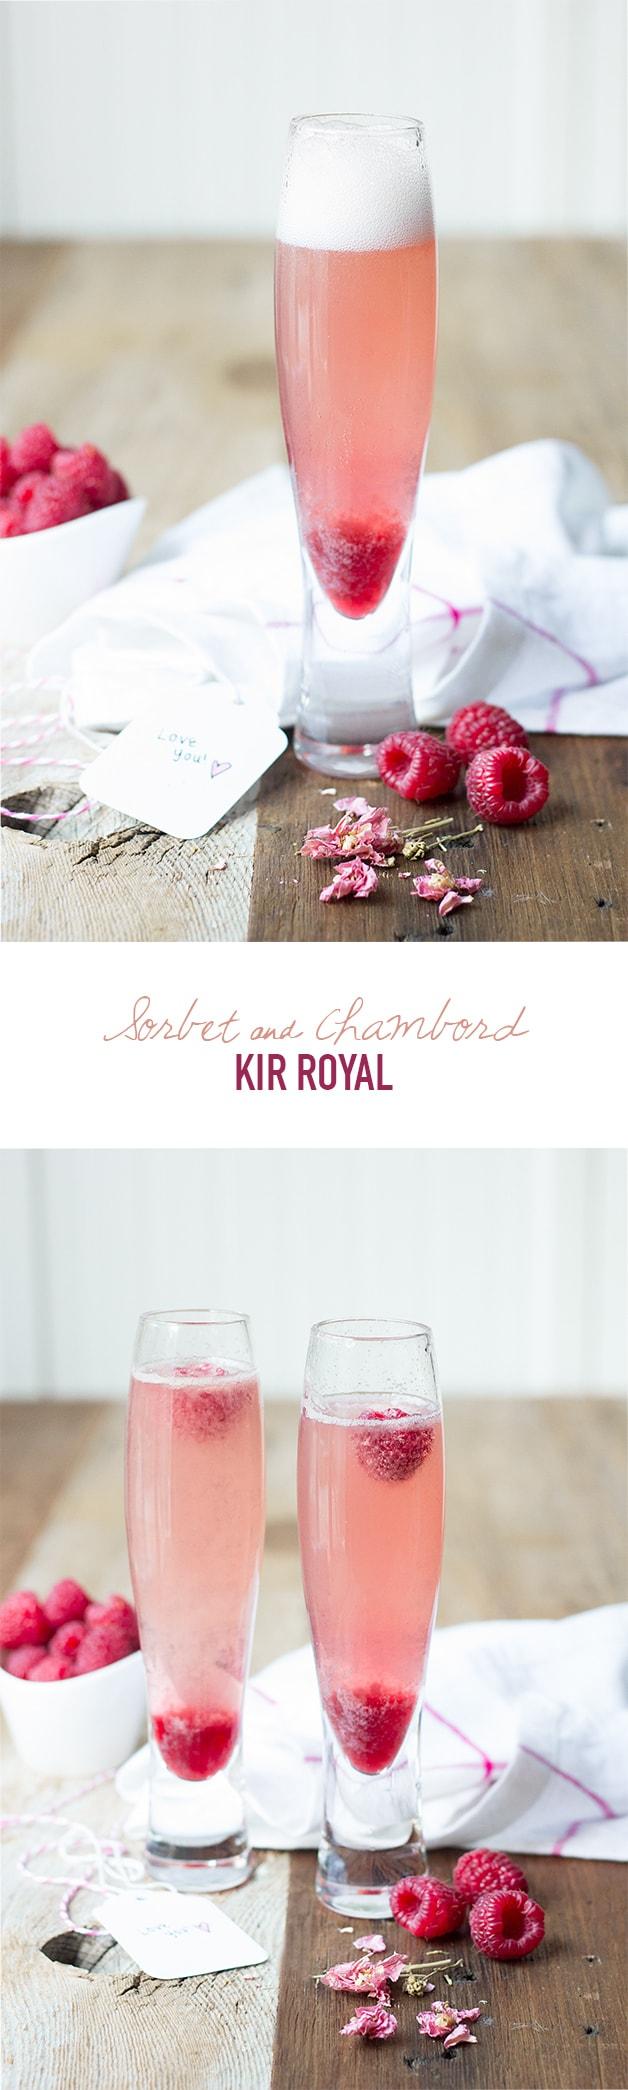 Sorbet & Chambord Kir Royale | www.brighteyedbaker.com